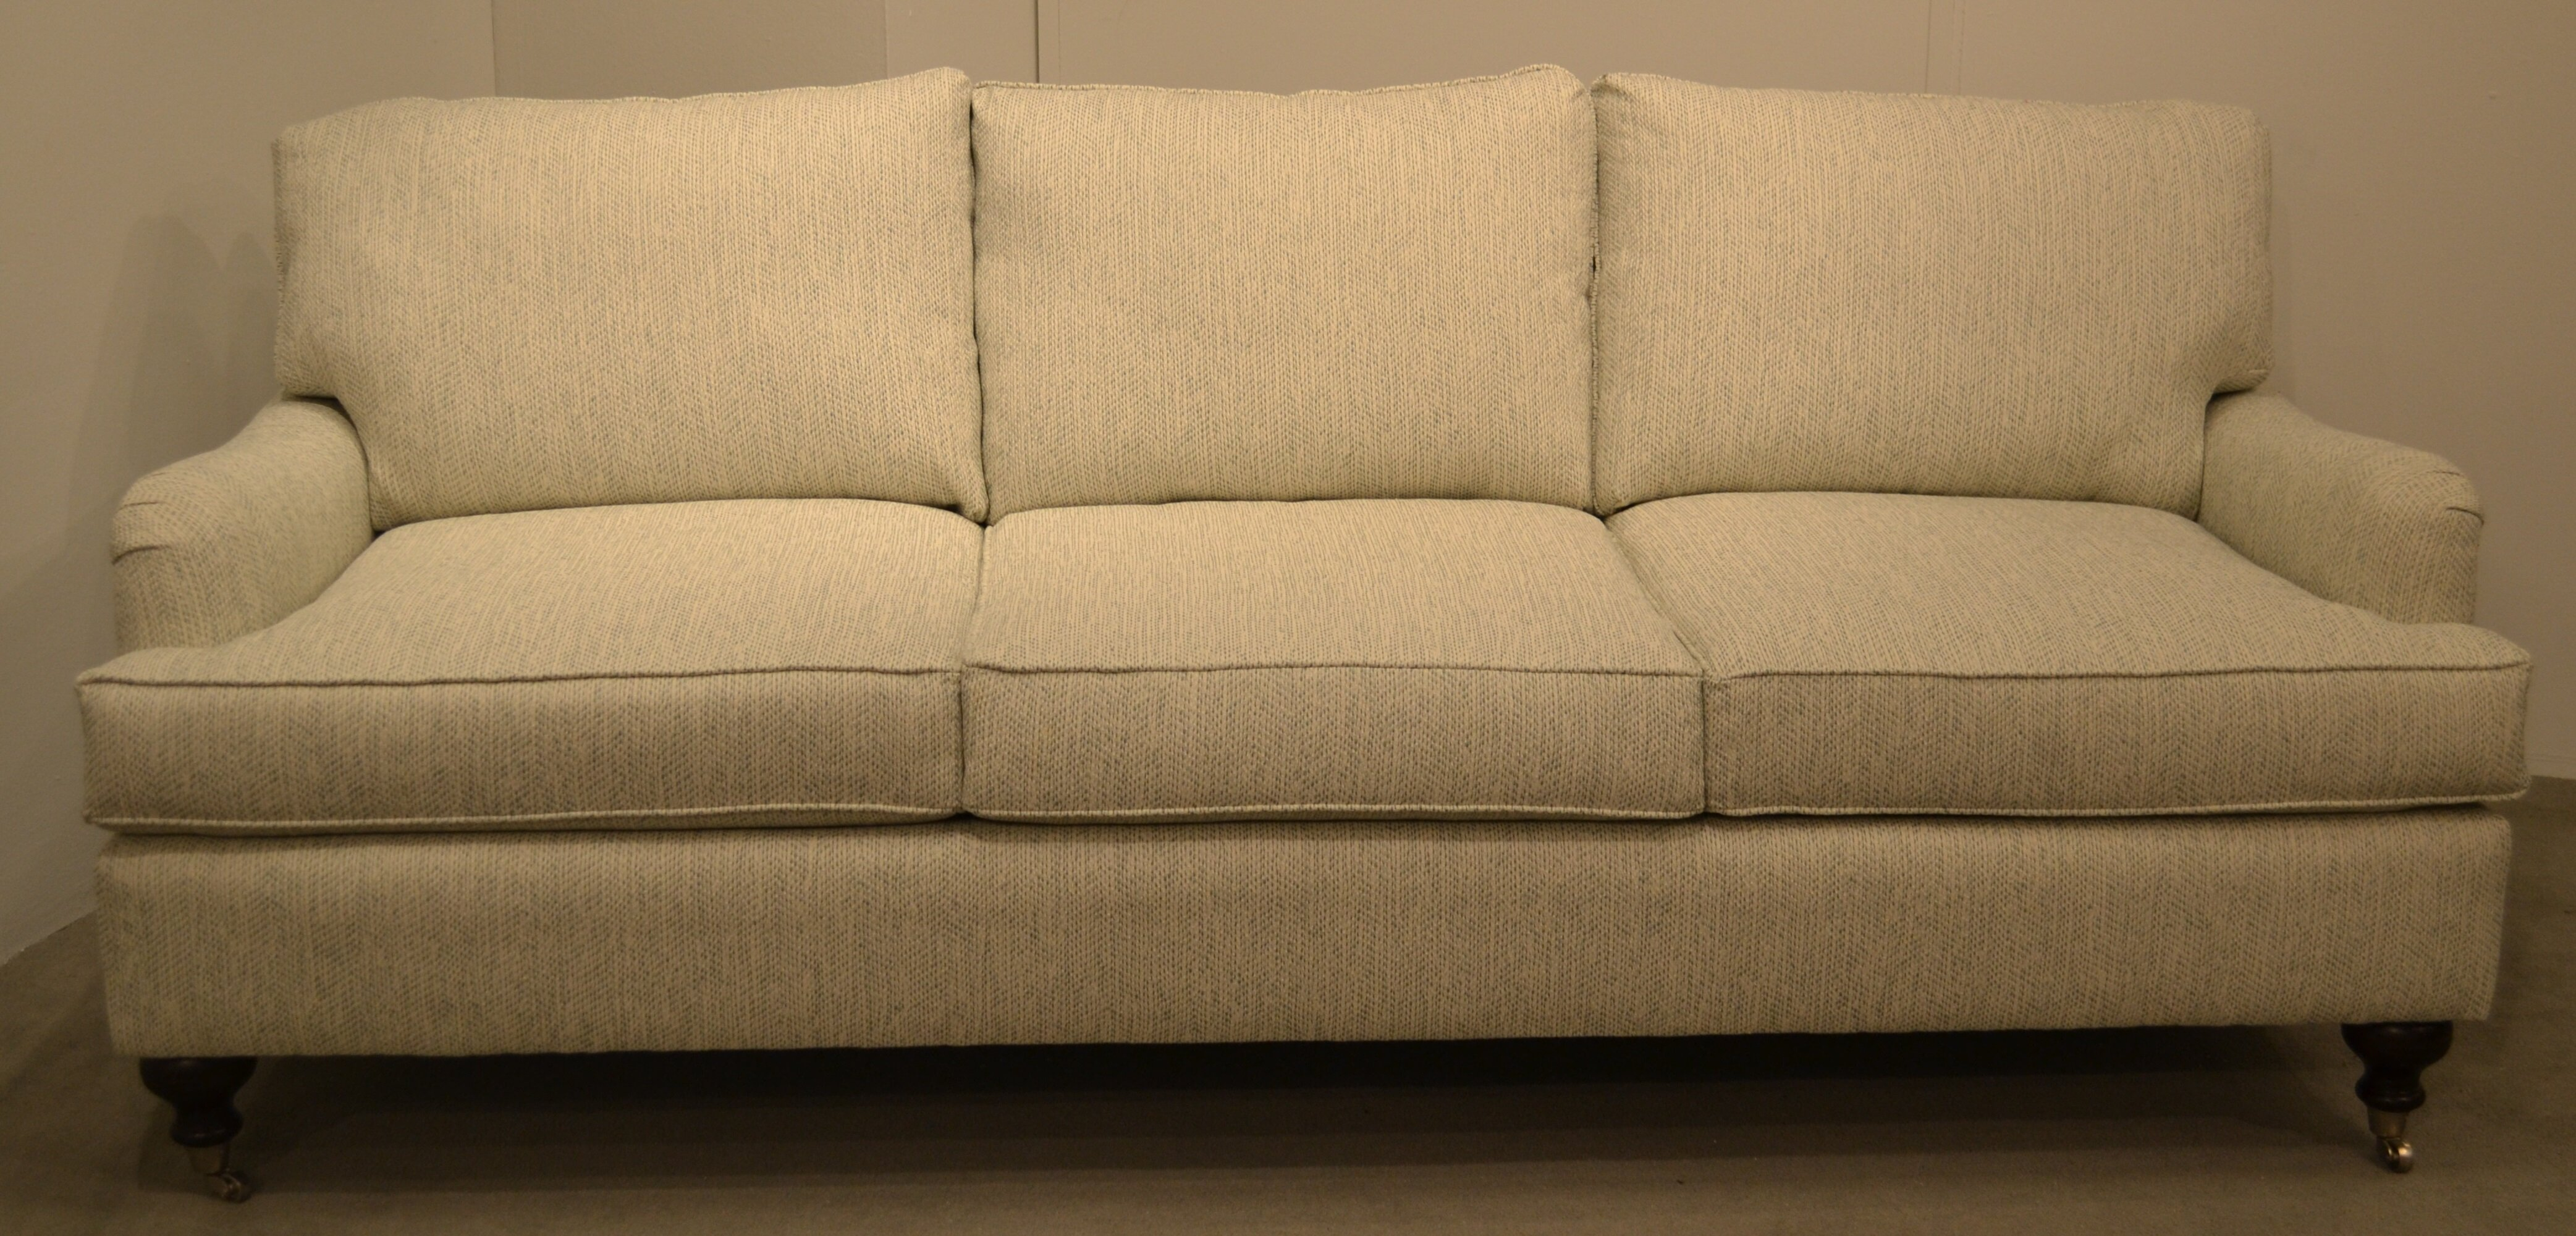 Carolina Classic Furniture Three Cushion Sofa | Wayfair